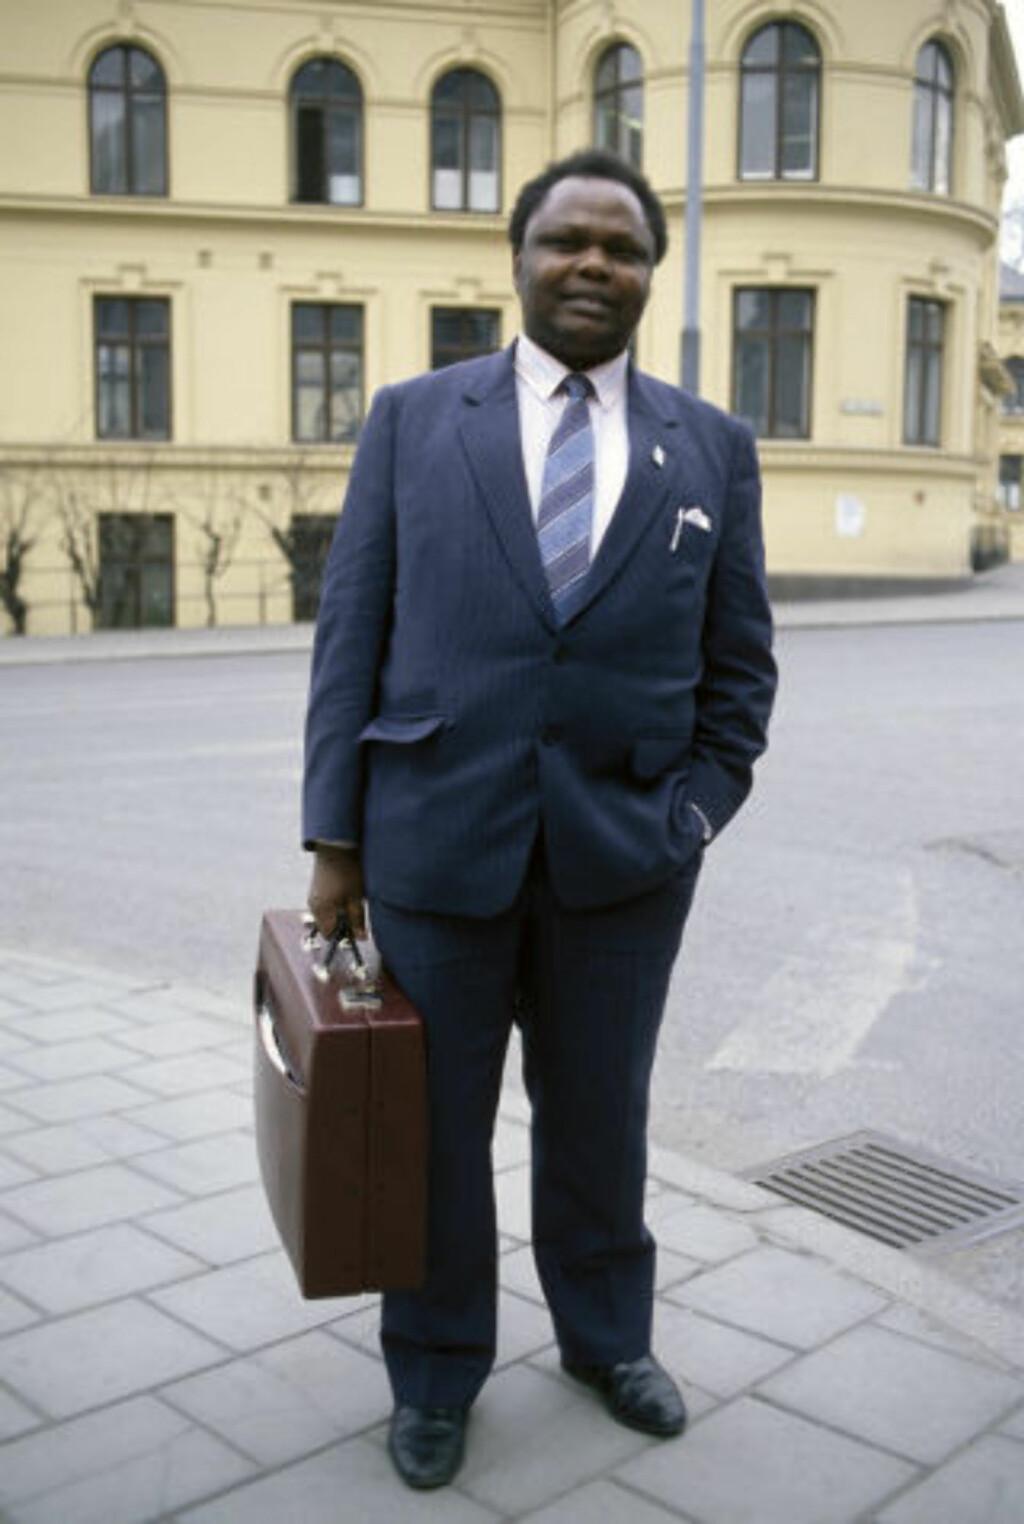 LURTE KONGO-FANGENE: Bløffmakeren Sammy Korir, fotografert her i 1988. Foto;Glen Widing / SCANFOTO